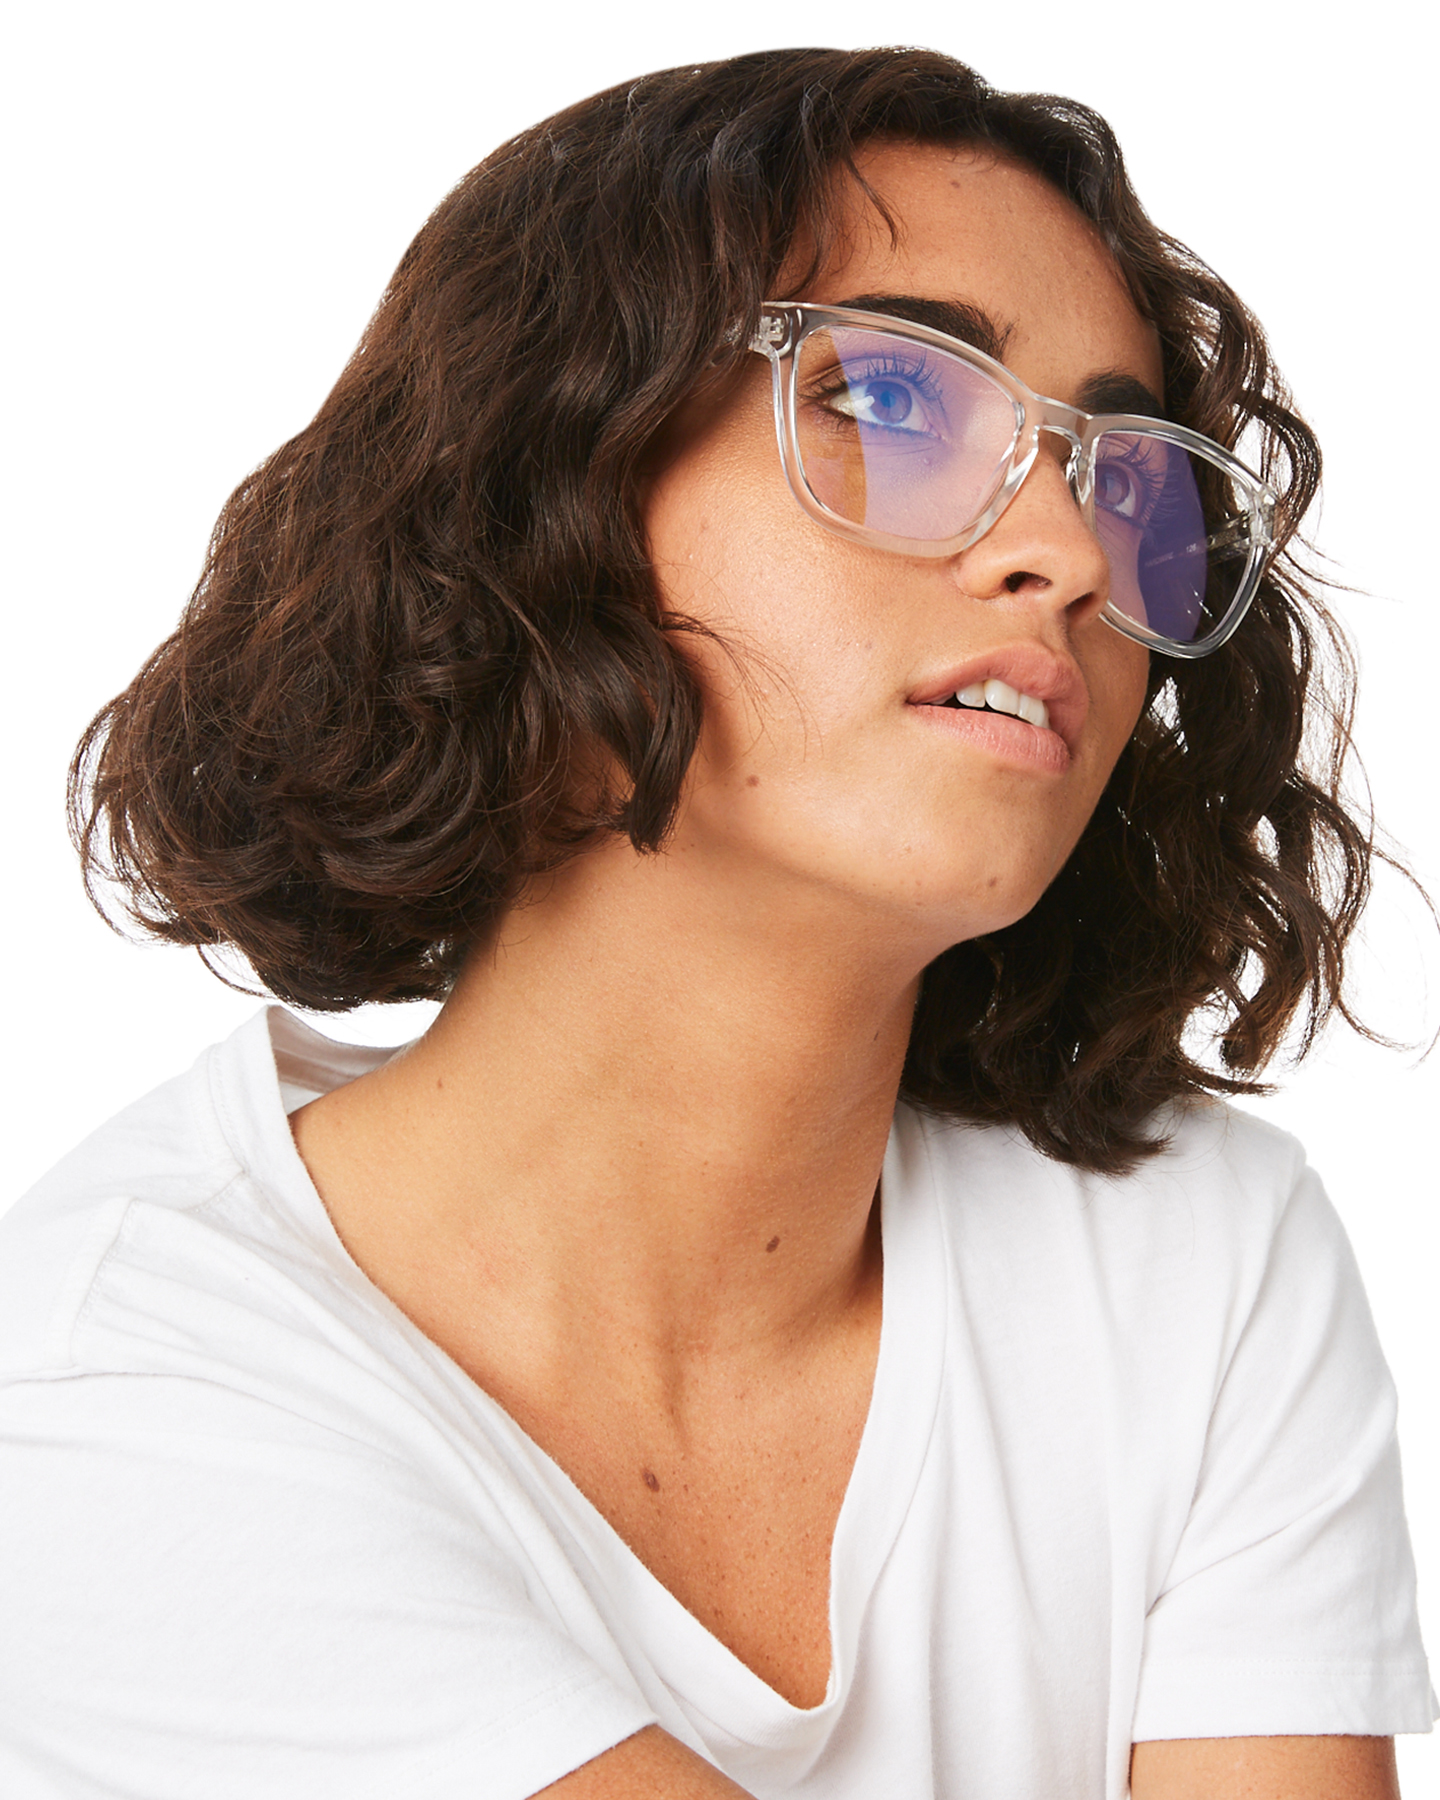 a87f8d77fe3 New Quay Eyewear Women s Hardwire Blue Light Blocker Glasses Natural ...